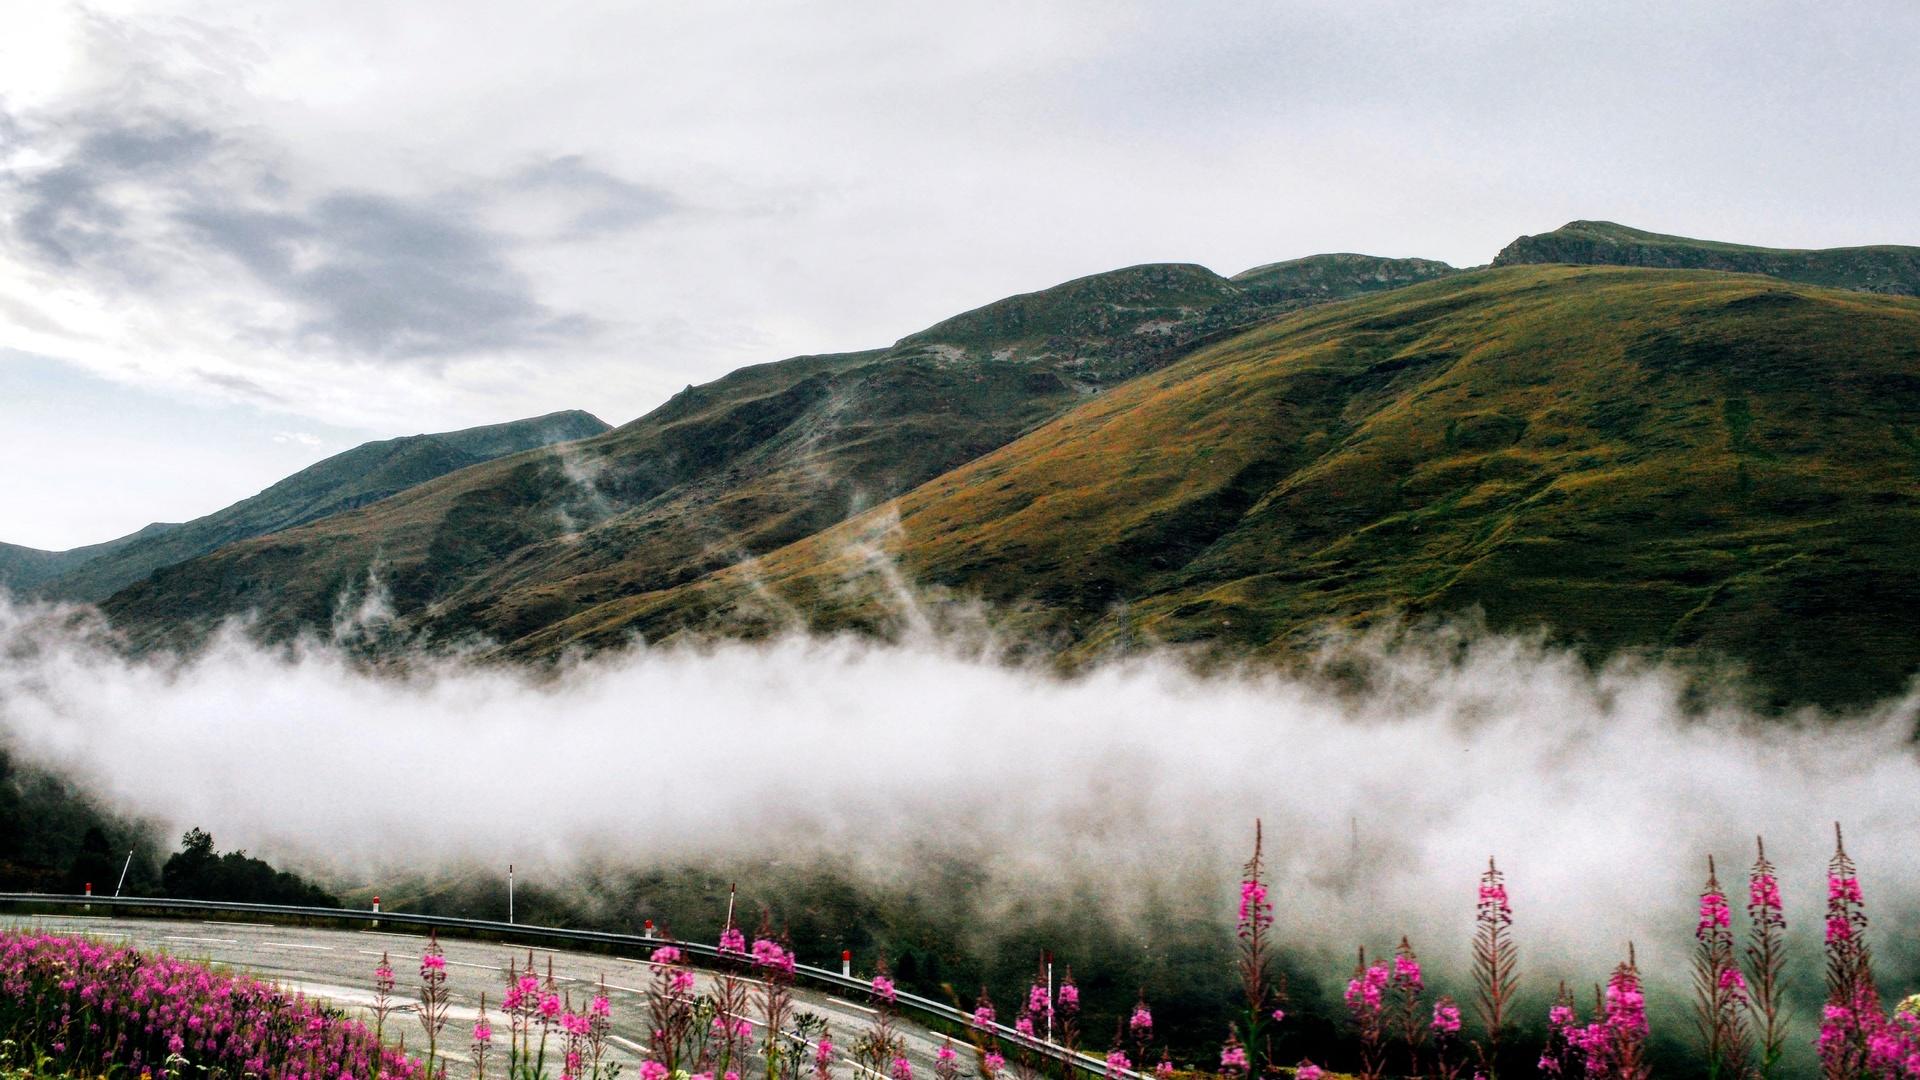 горы, туман, дорога, испания